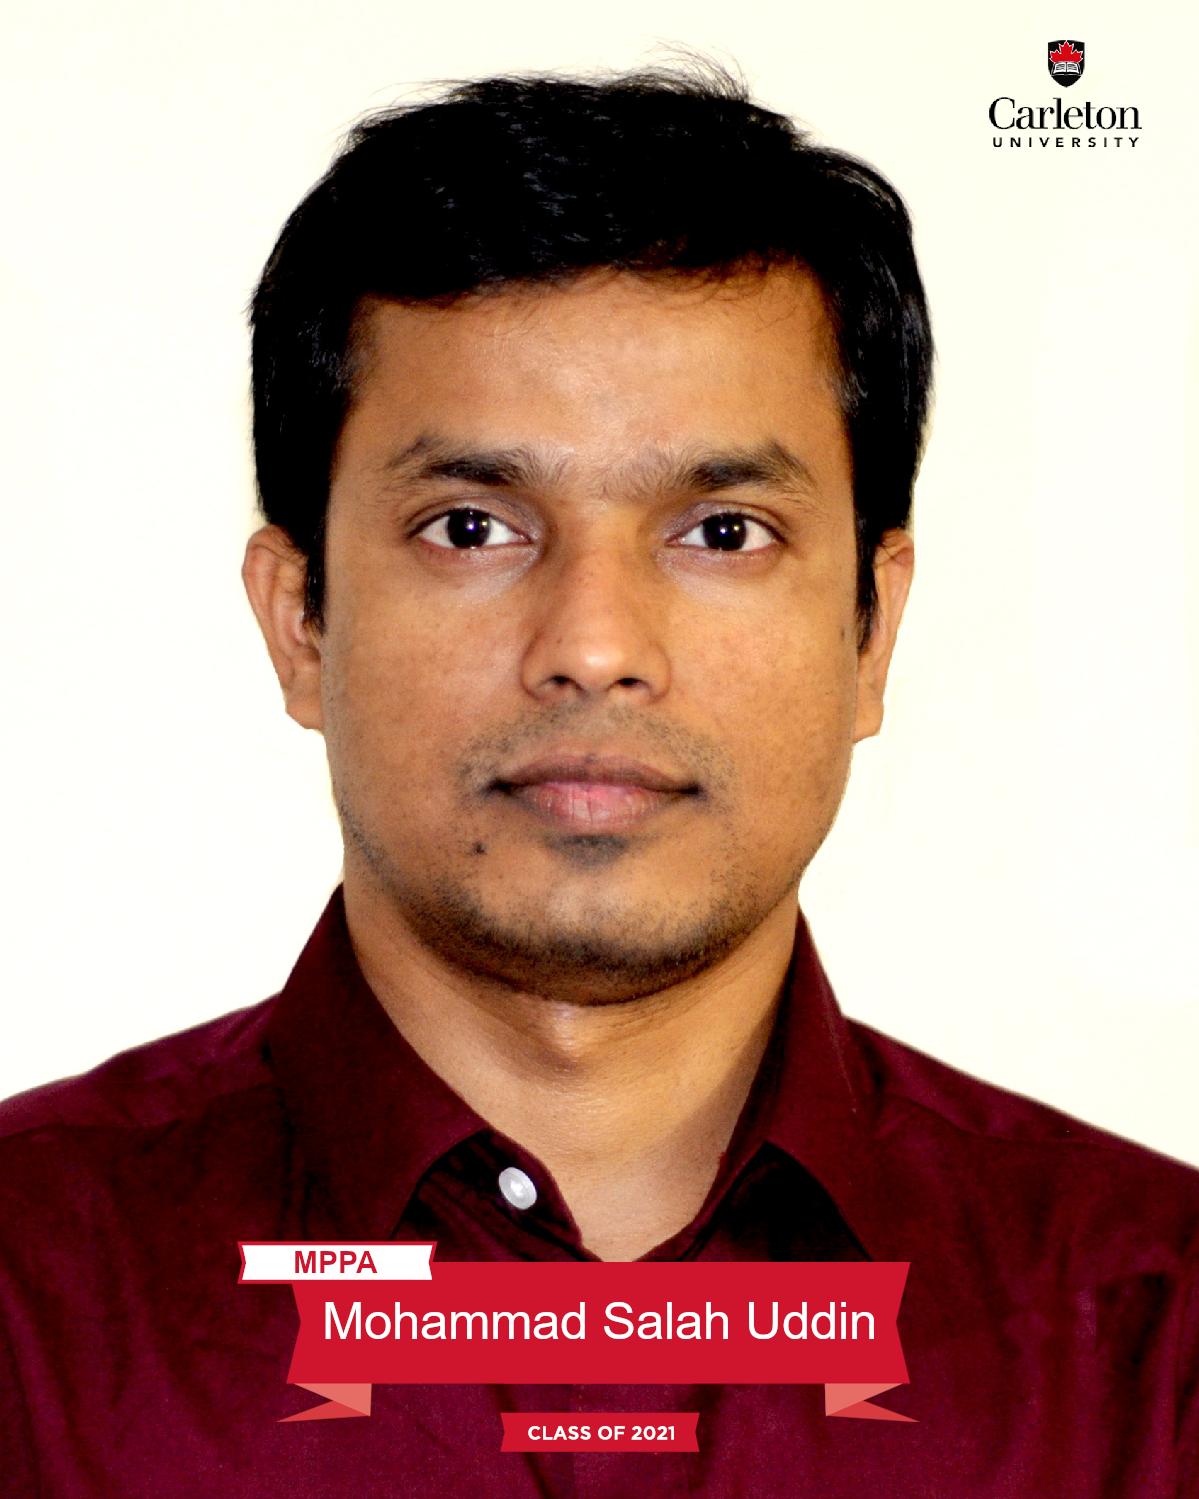 Mohammad Salah Uddin. MPPA graduate, class of 2021